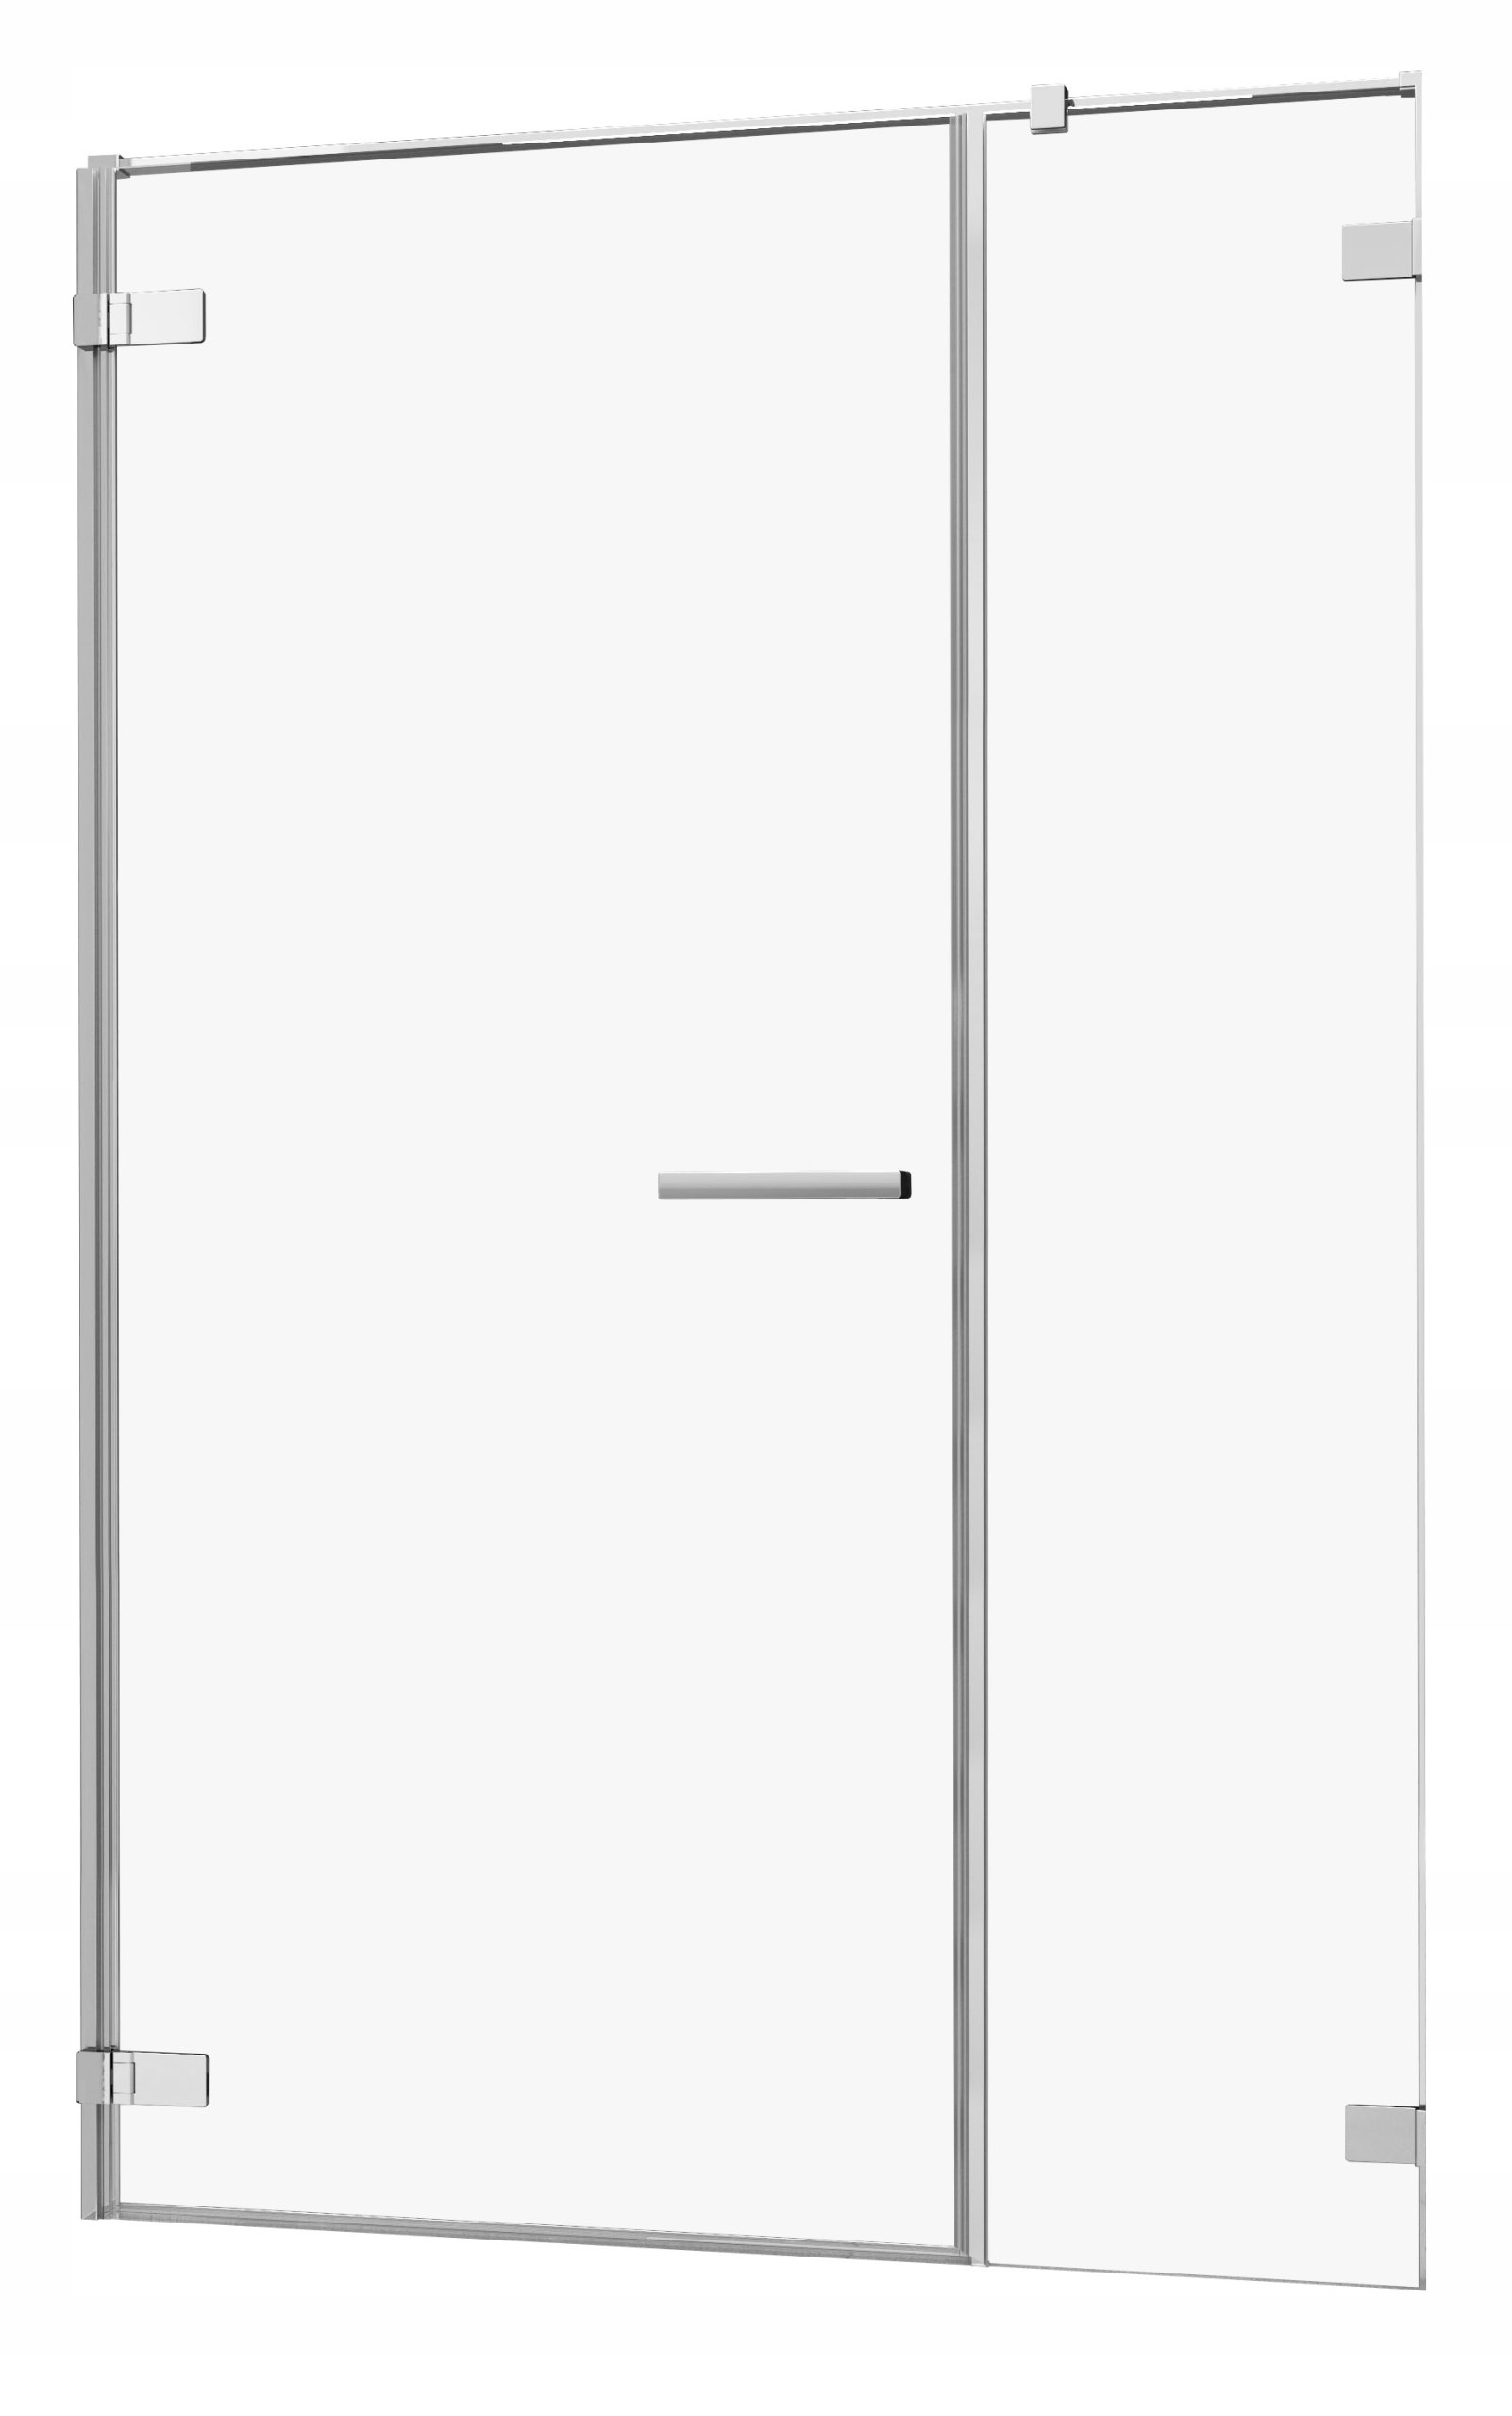 Sprchové dvere Arta DWS 130x200 RADAWAY